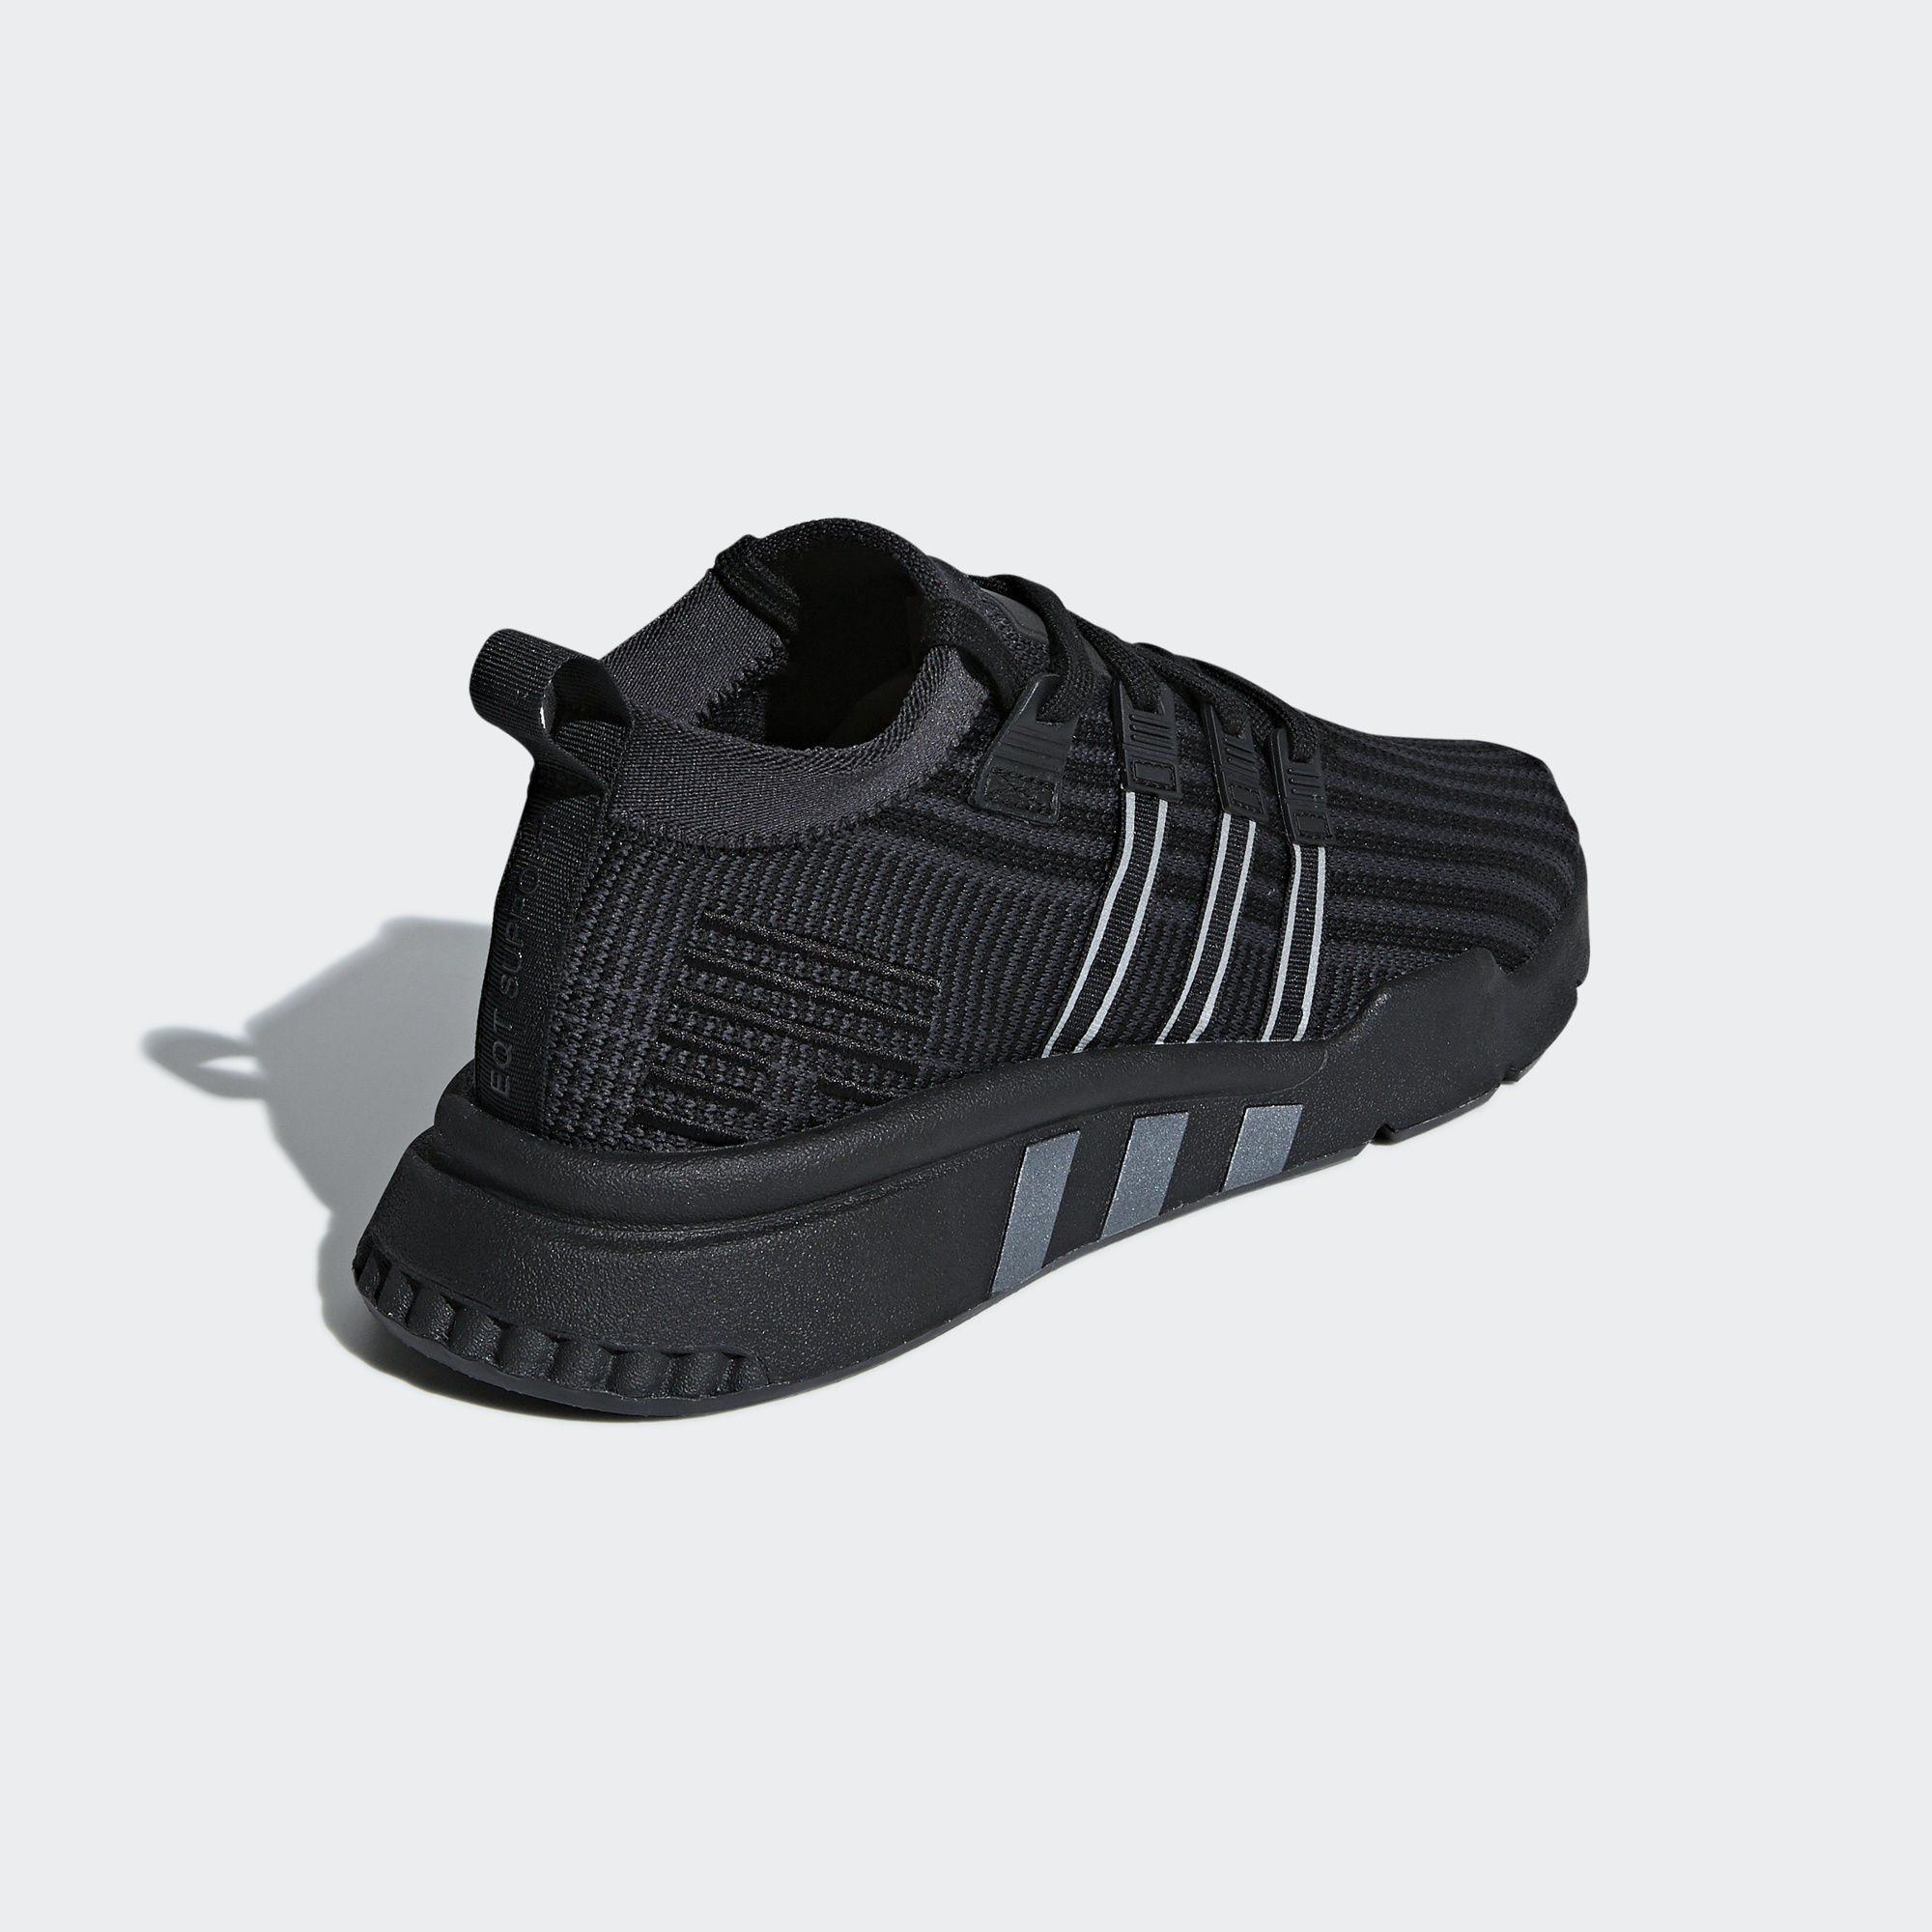 Adidas EQT Support Mid ADV Primeknit Core Black / Carbon / Solar Yellow (B37456)